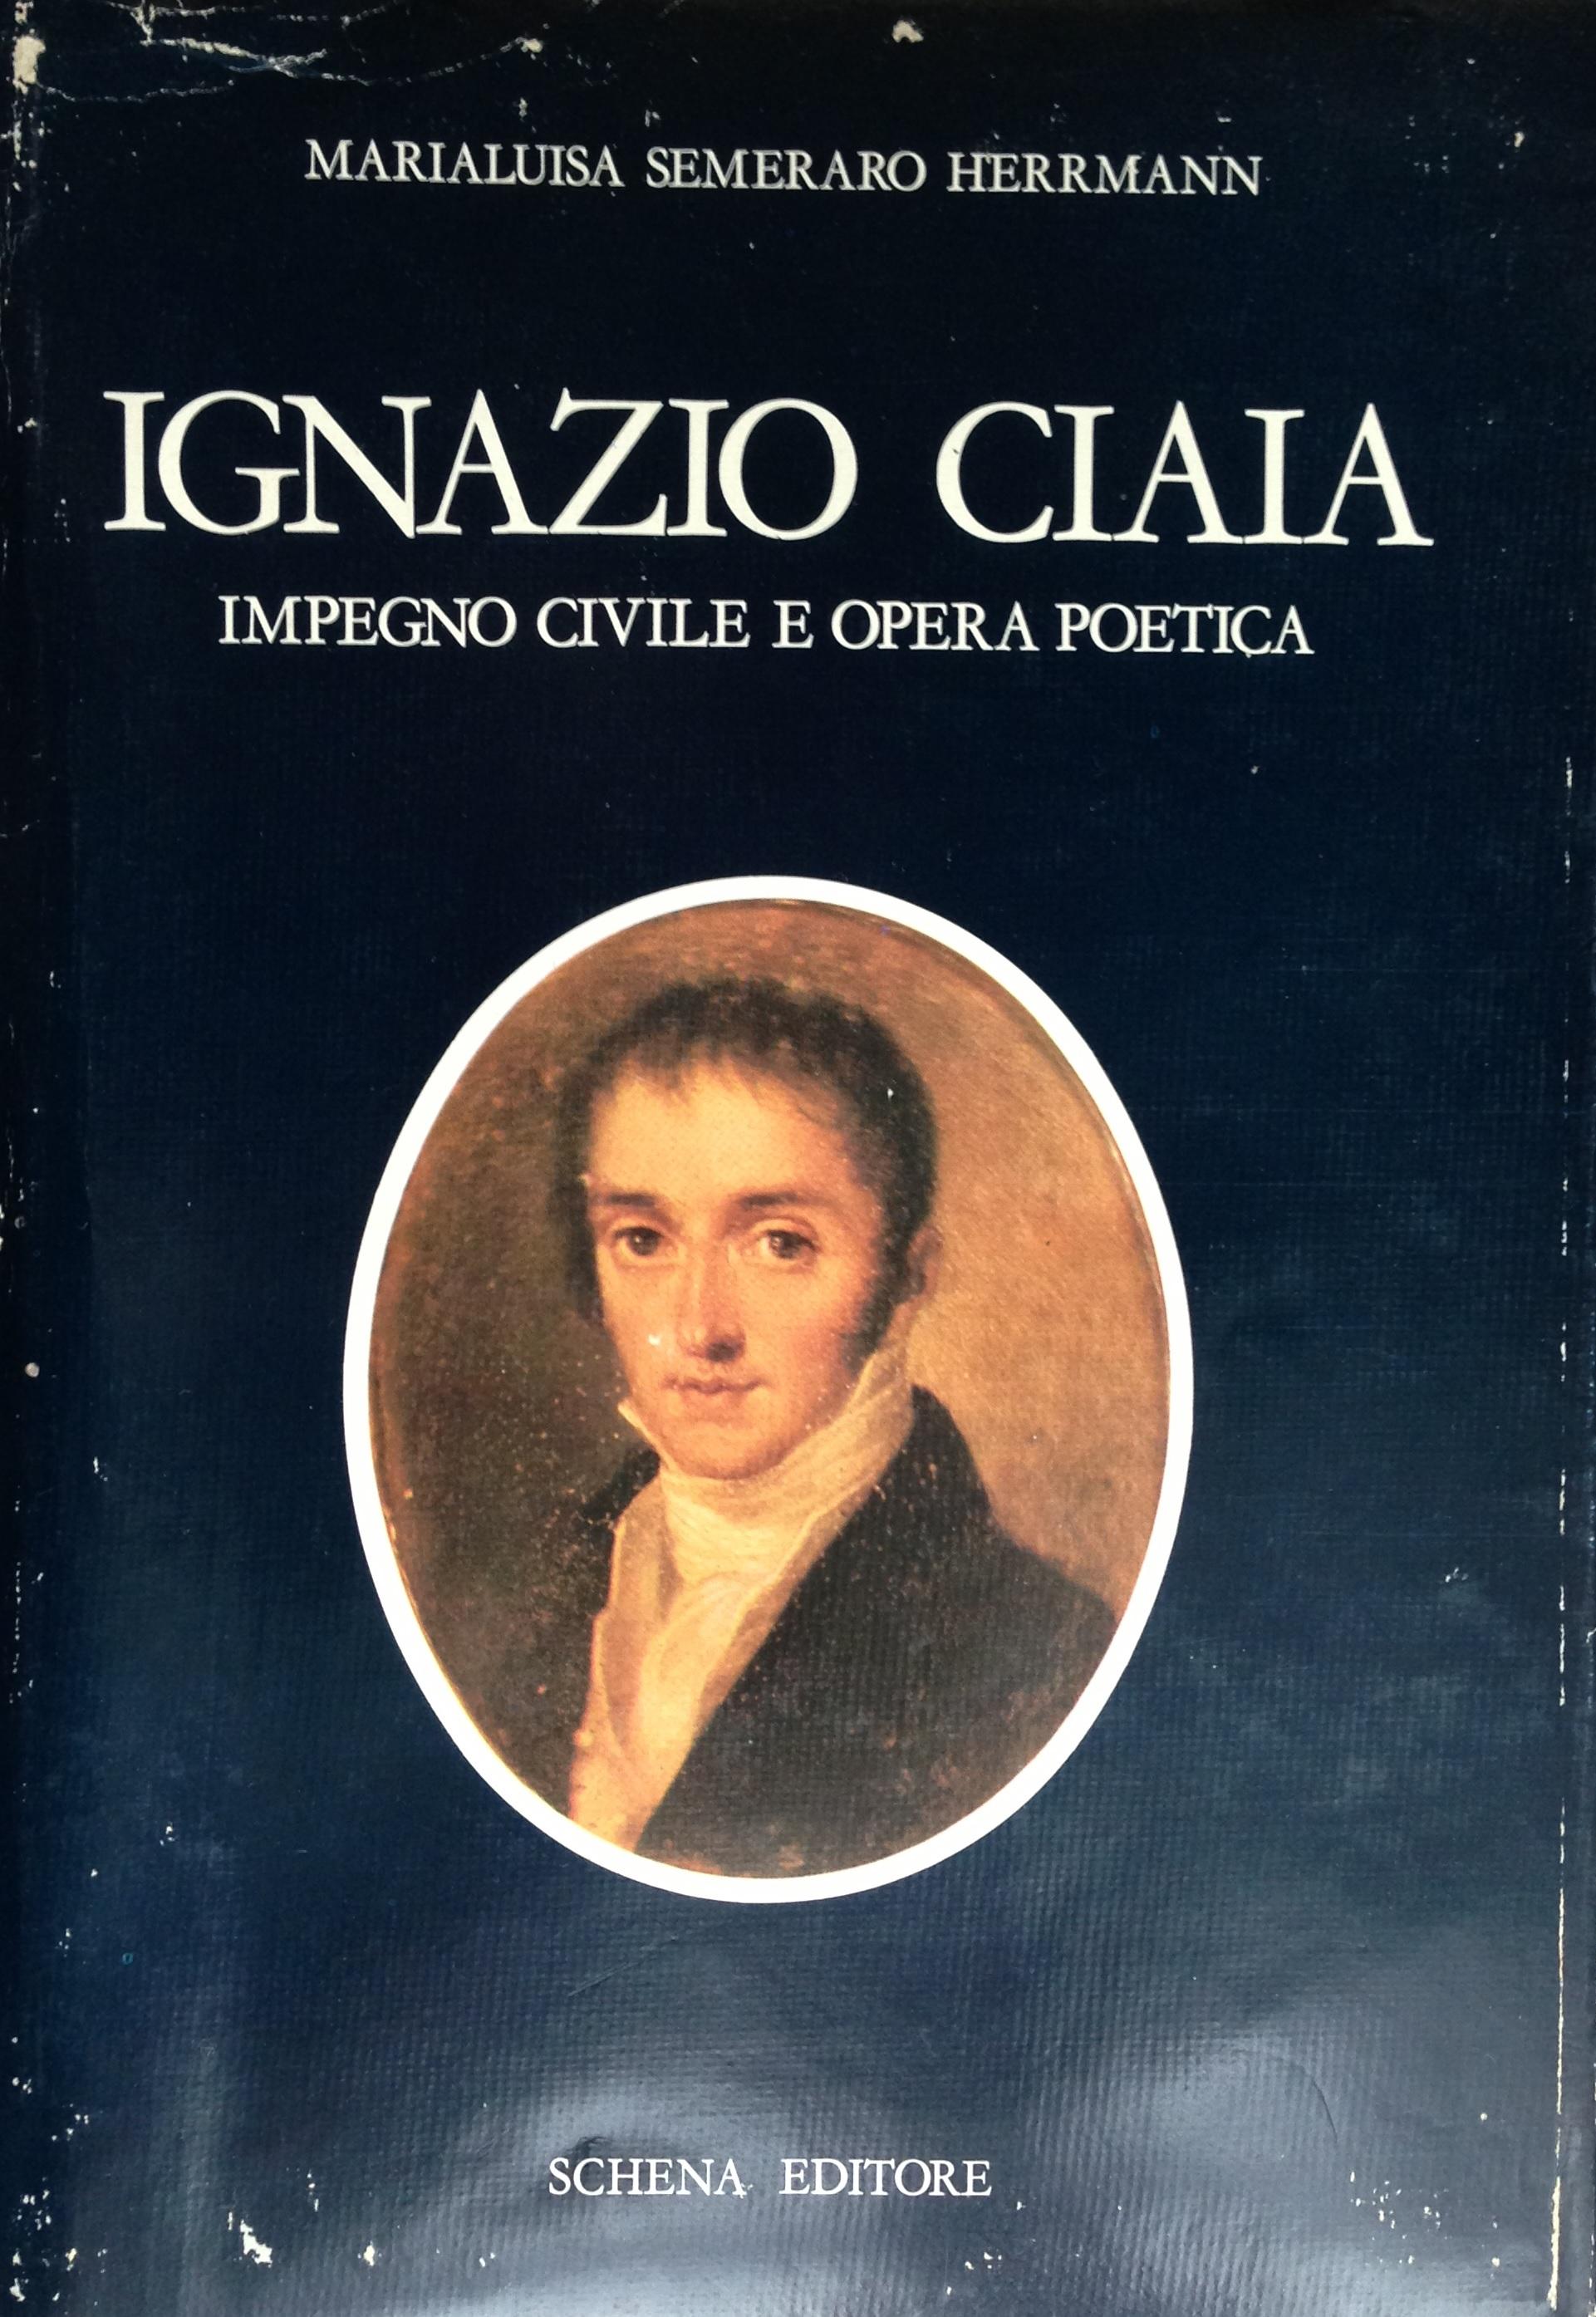 Ignazio Ciaia